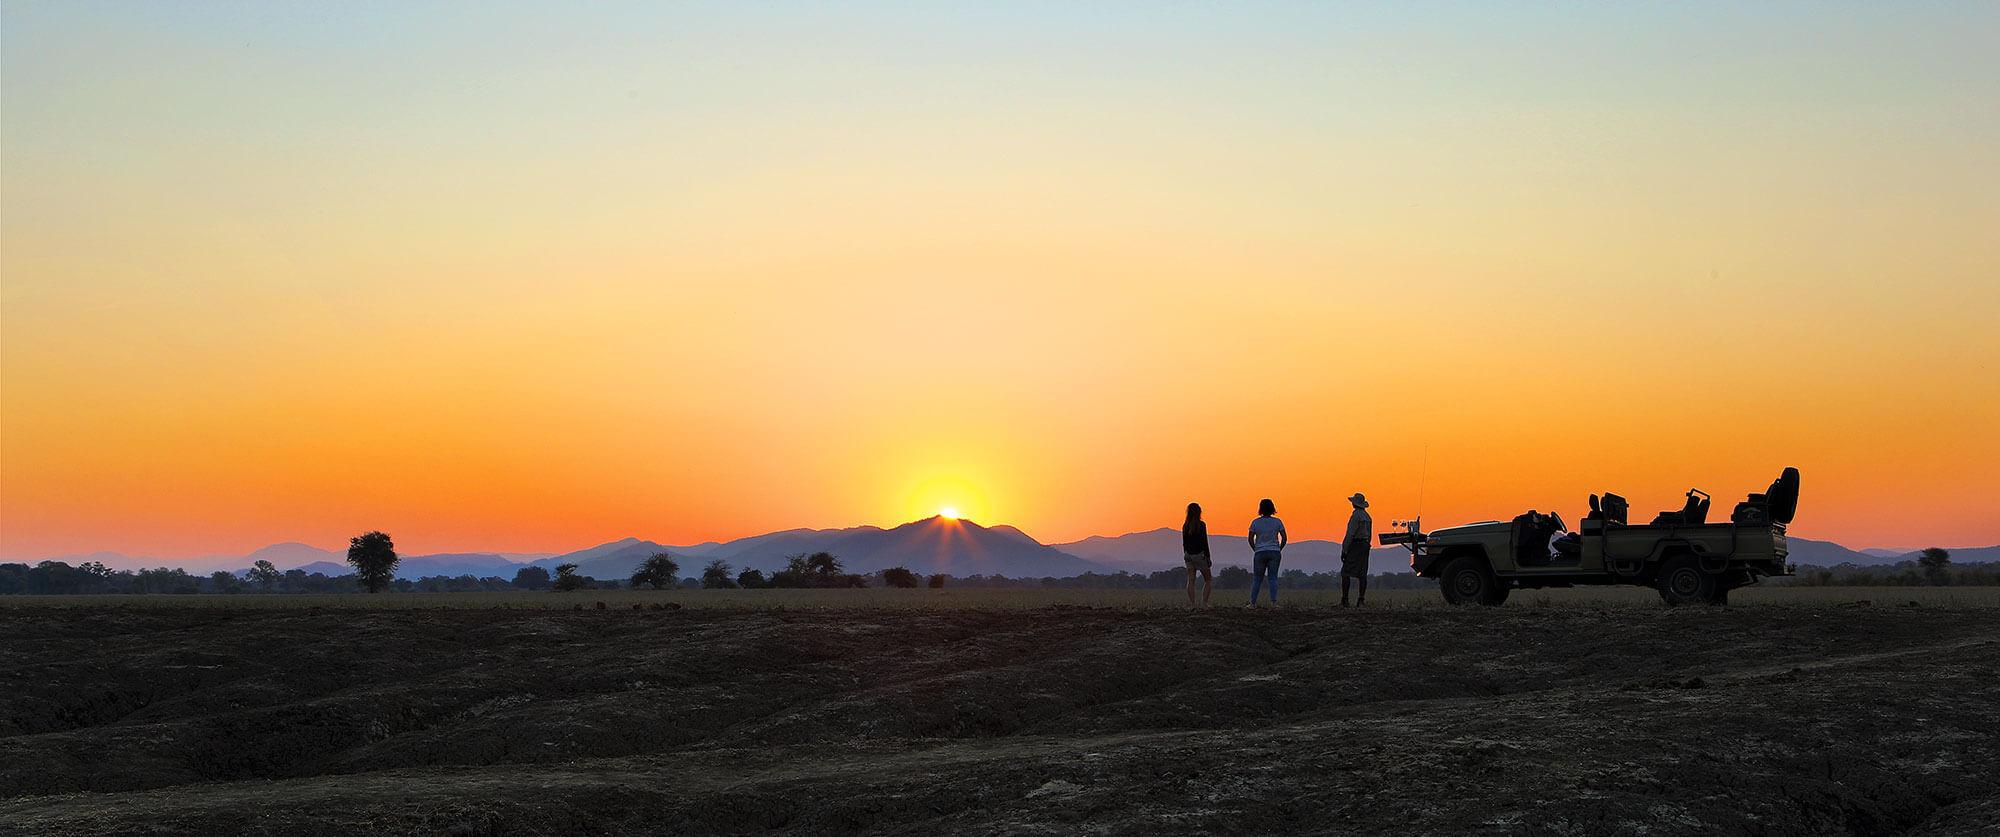 Sundowners at Anabezi Luxury Tented Camp - Wildlife Safari and Beach: Zambia and Lake Malawi Luxury Tour